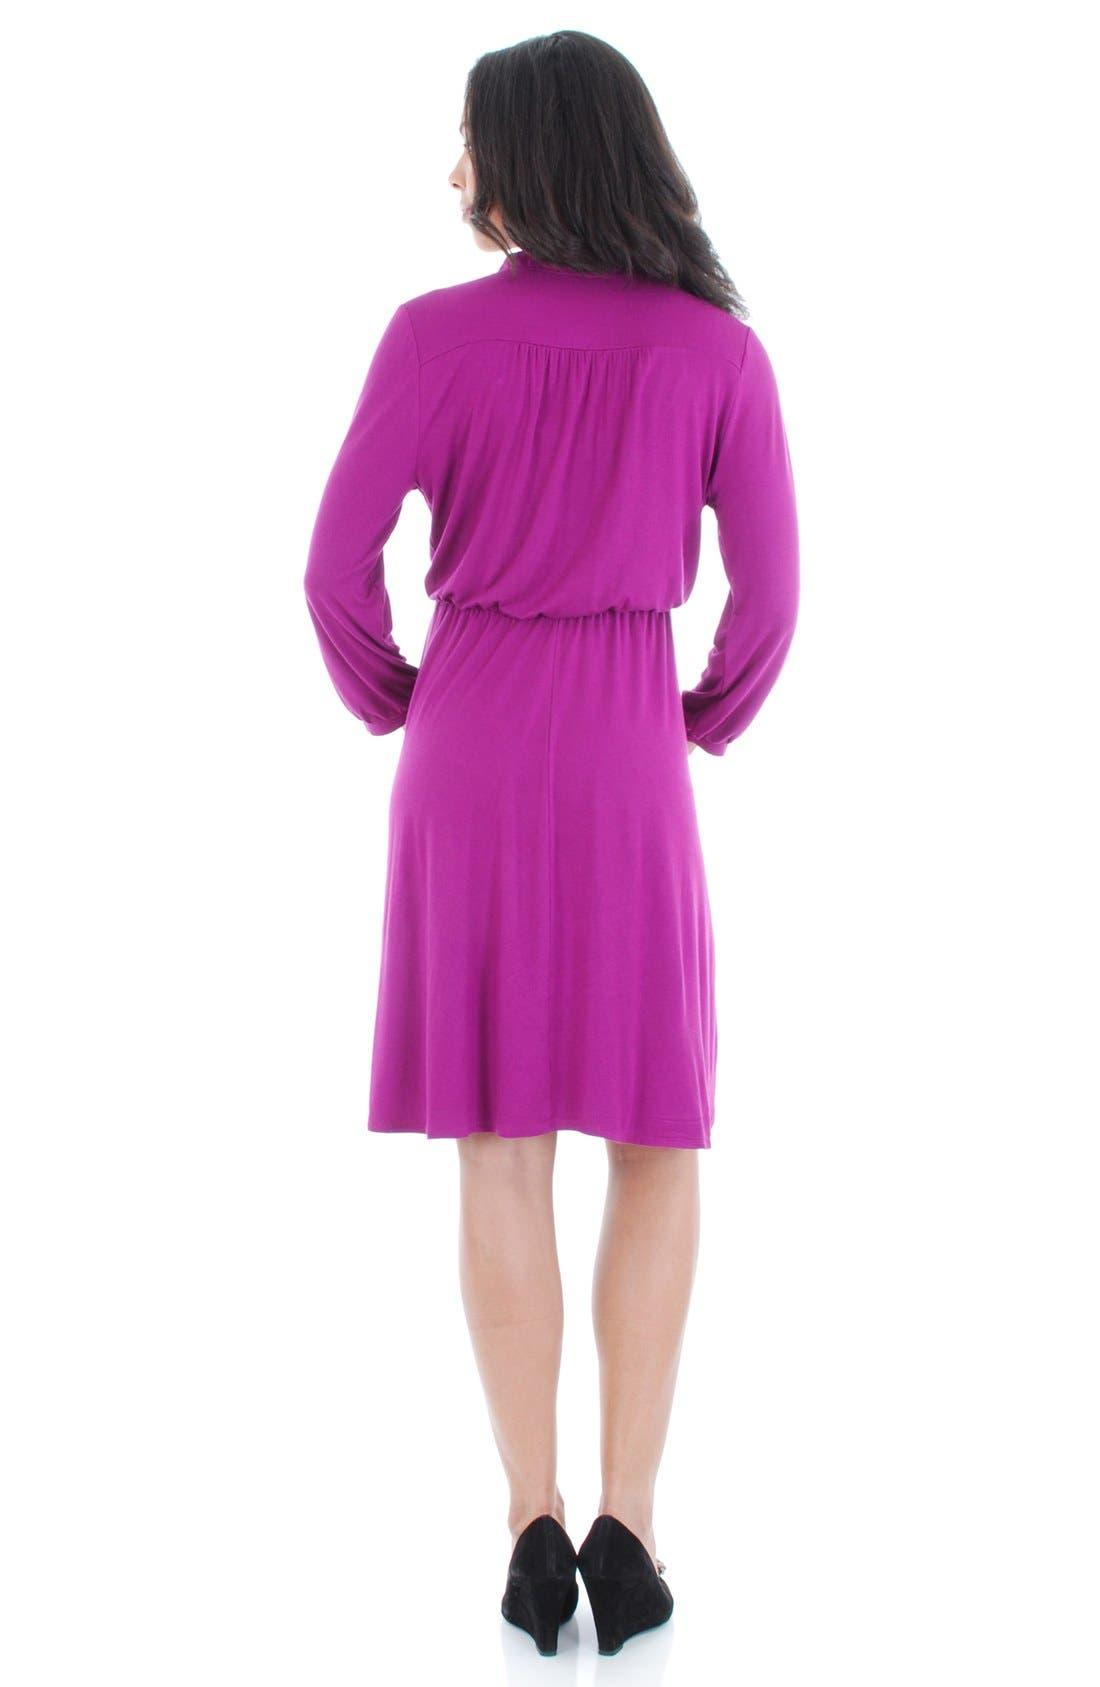 EverlyGrey 'Sicily' Maternity/Nursing Dress,                             Alternate thumbnail 2, color,